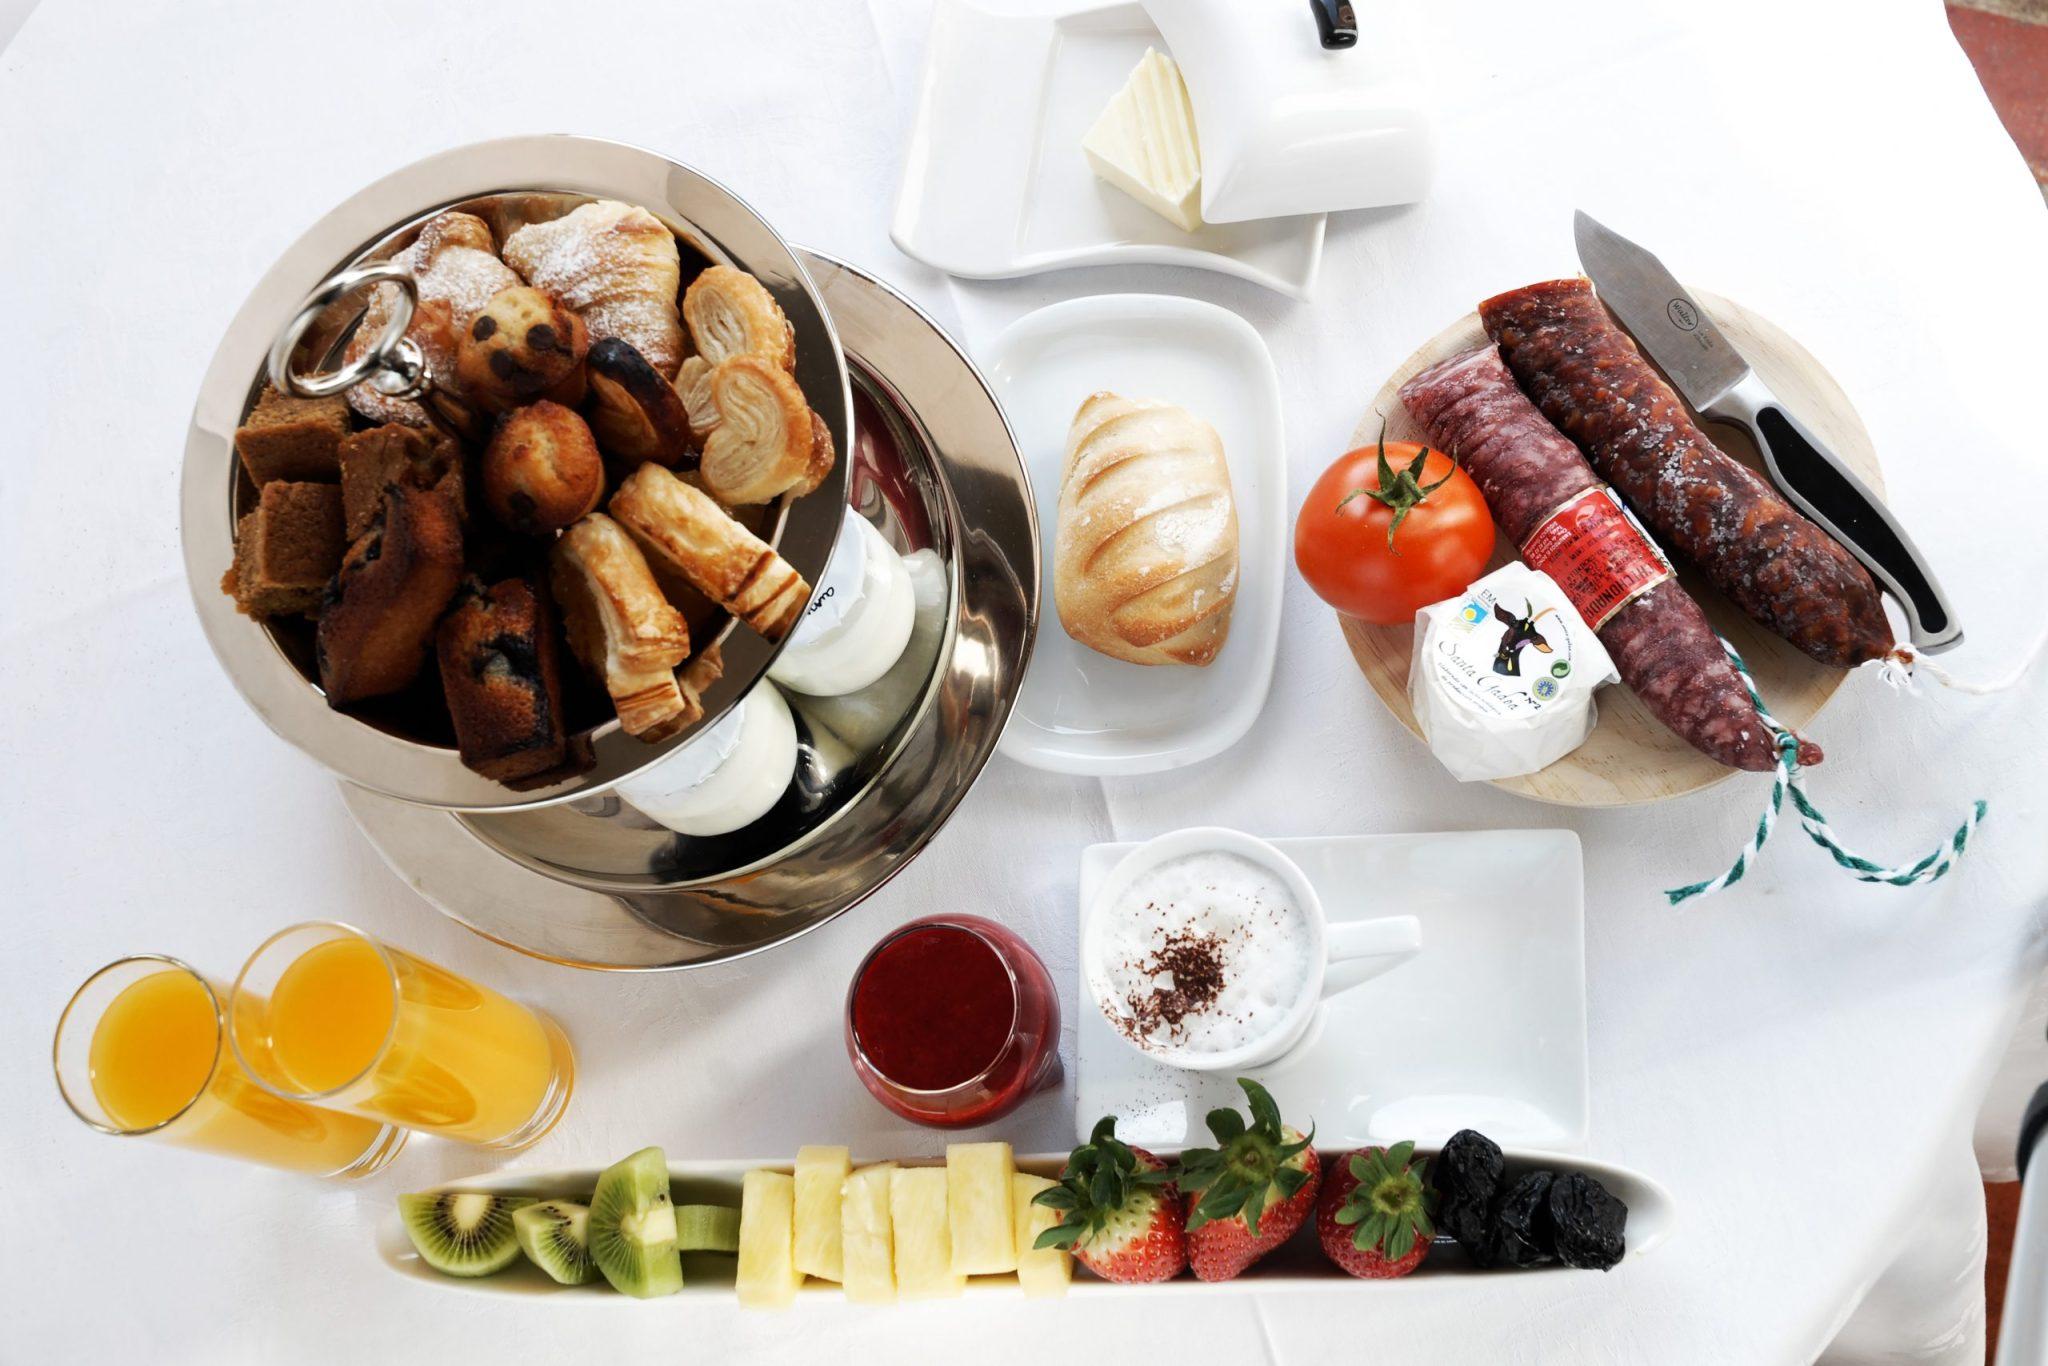 Molino-de-Alcuneza-RelaisChateaux_Restaurante_desayunos-del-molino-de-alcuneza-con-zumos-naturales-yogures-artesanos-3-scaled.jpg